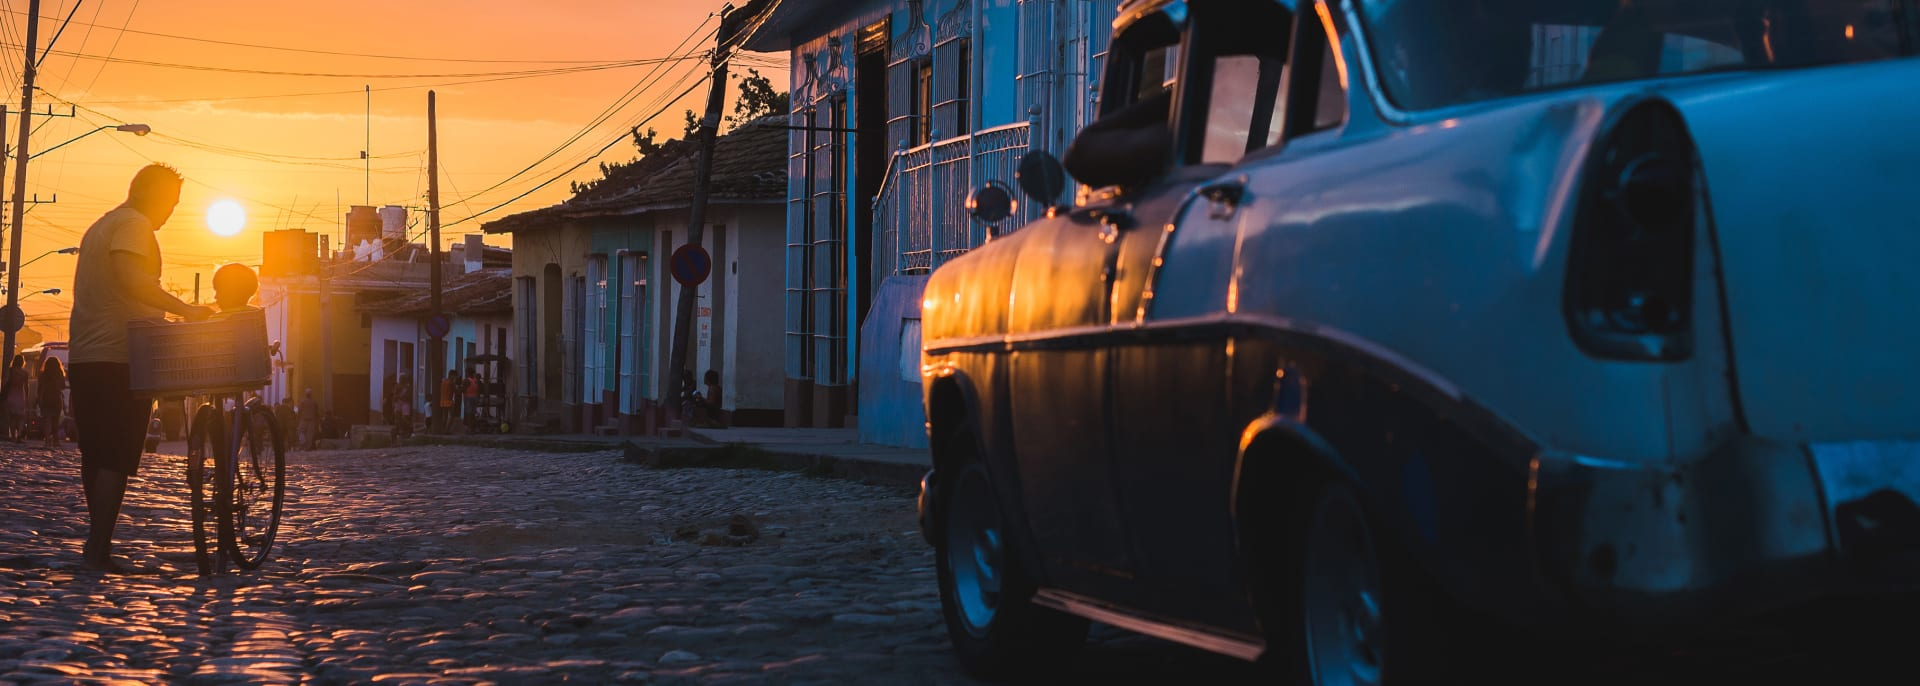 kubanischer Straßensonnenuntergang mit Oldtimer in Trinidad, Kuba